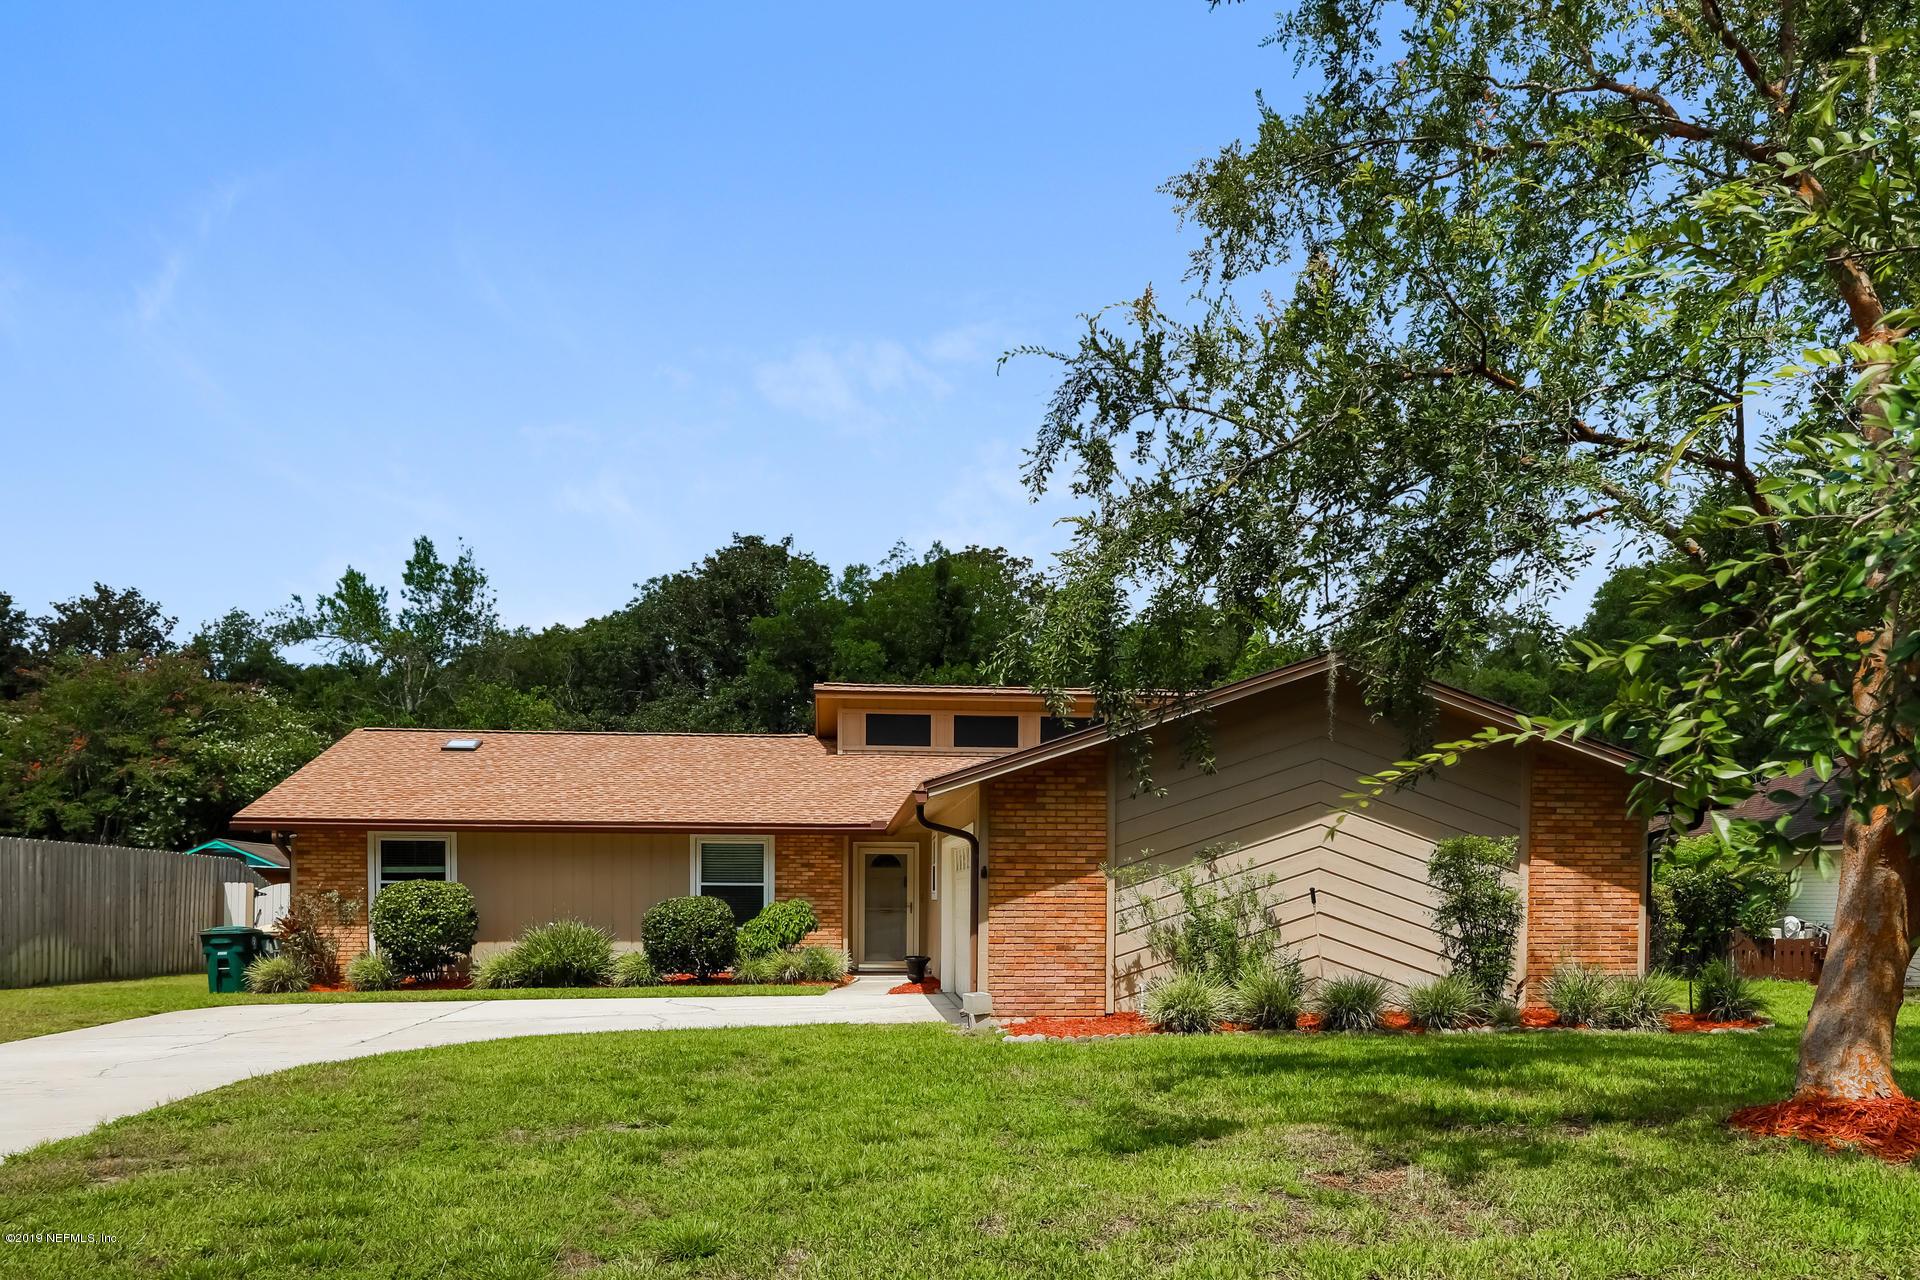 12524 Shady Creek Dr Jacksonville, FL 32223